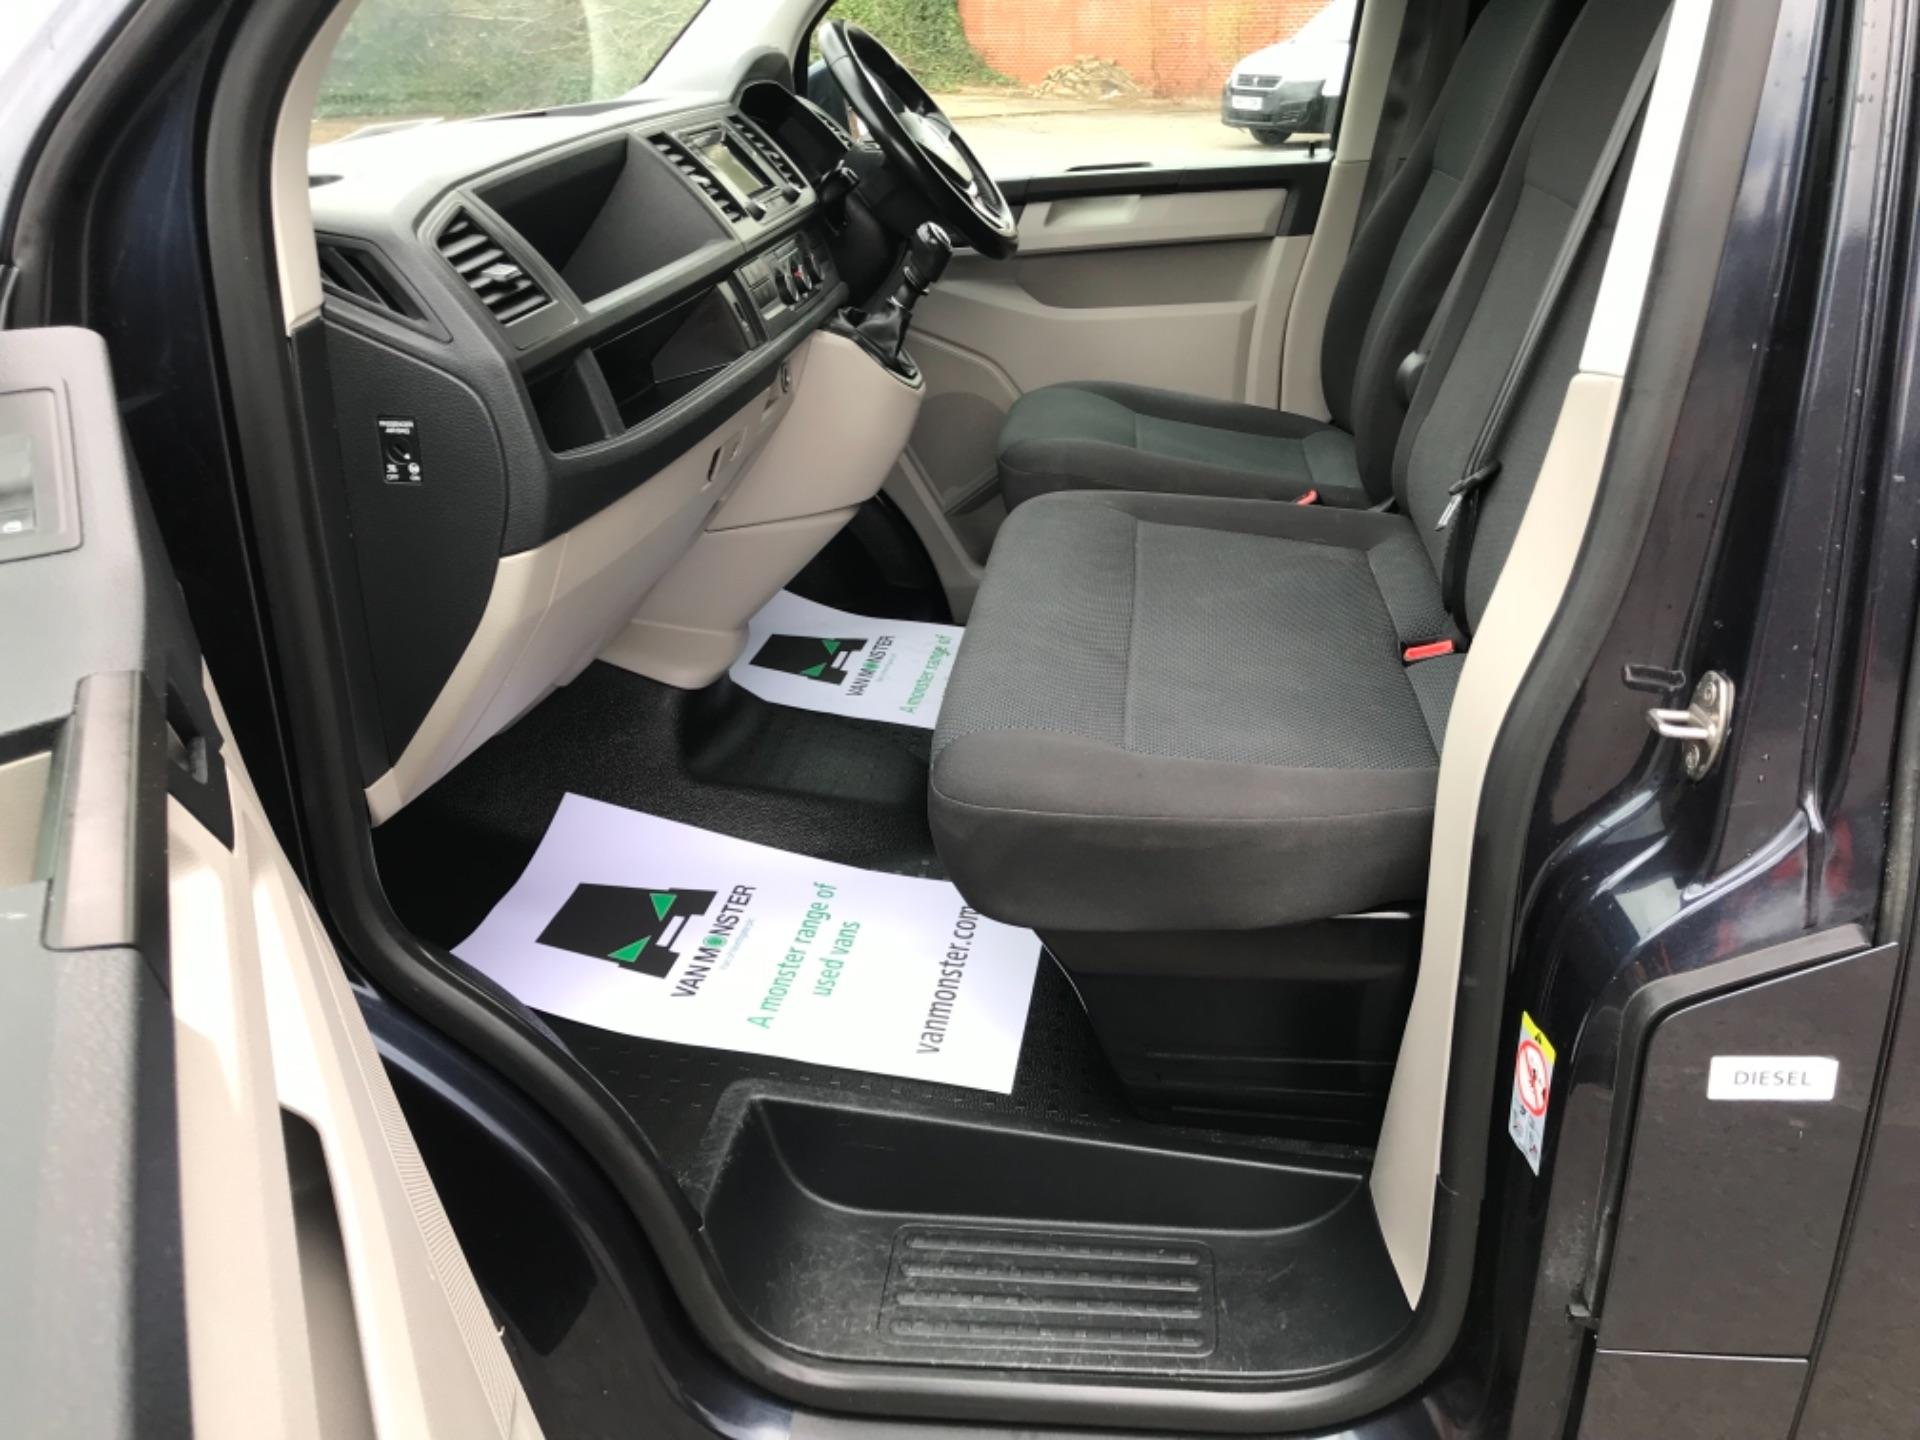 2019 Volkswagen Transporter 2.0 Tdi Bmt 150 Highline Van EURO 6 (GX69ZSN) Image 27